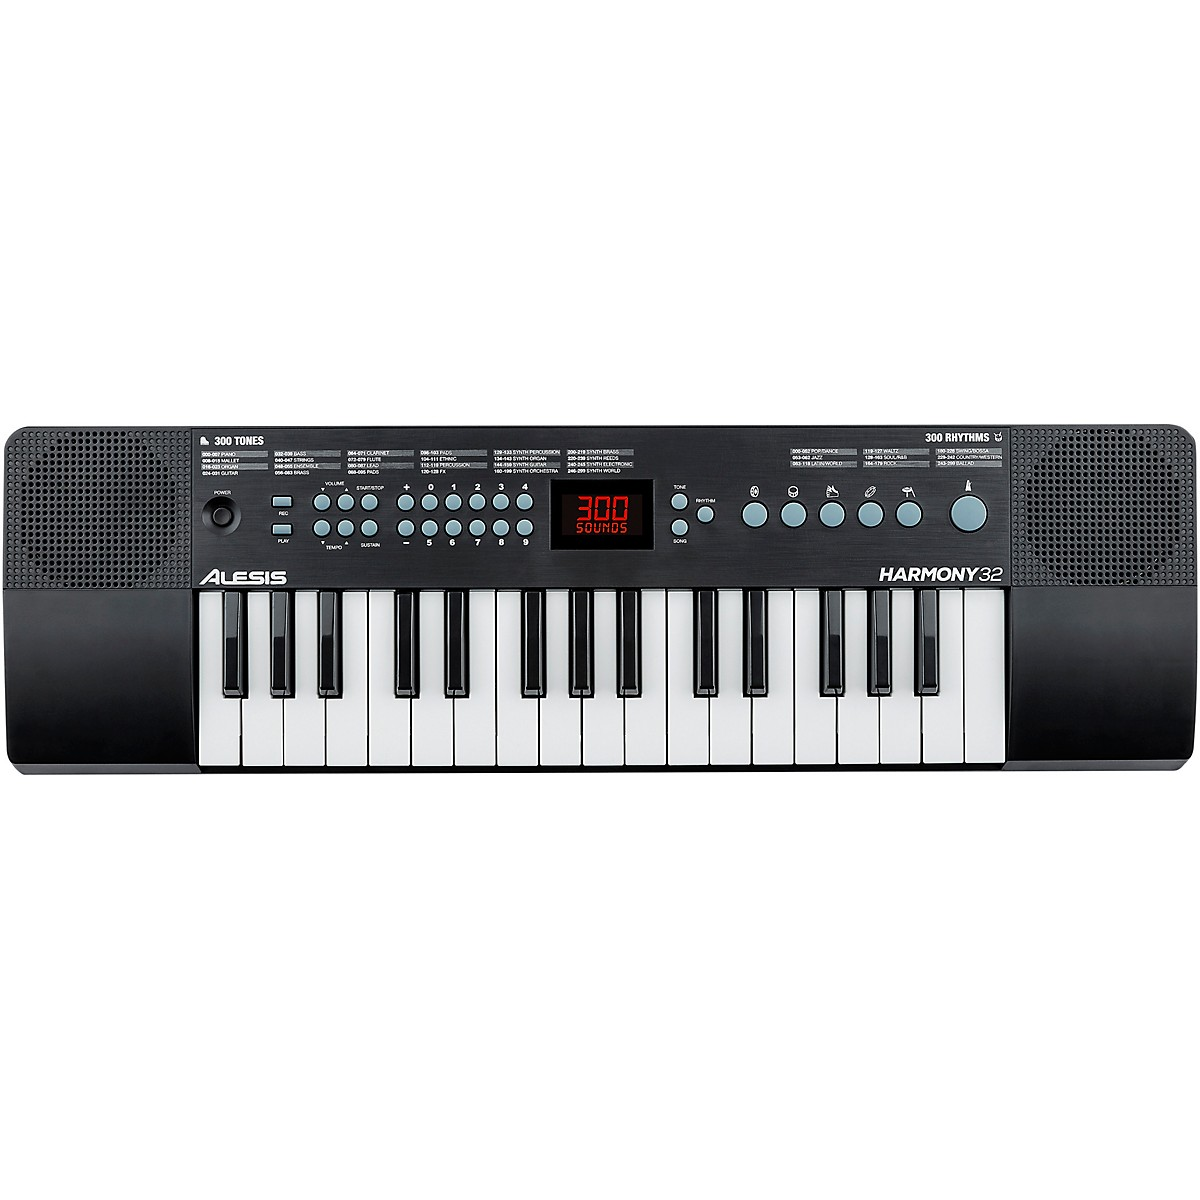 Alesis Harmony 32 32-Key Portable Keyboard With Built-In Speakers